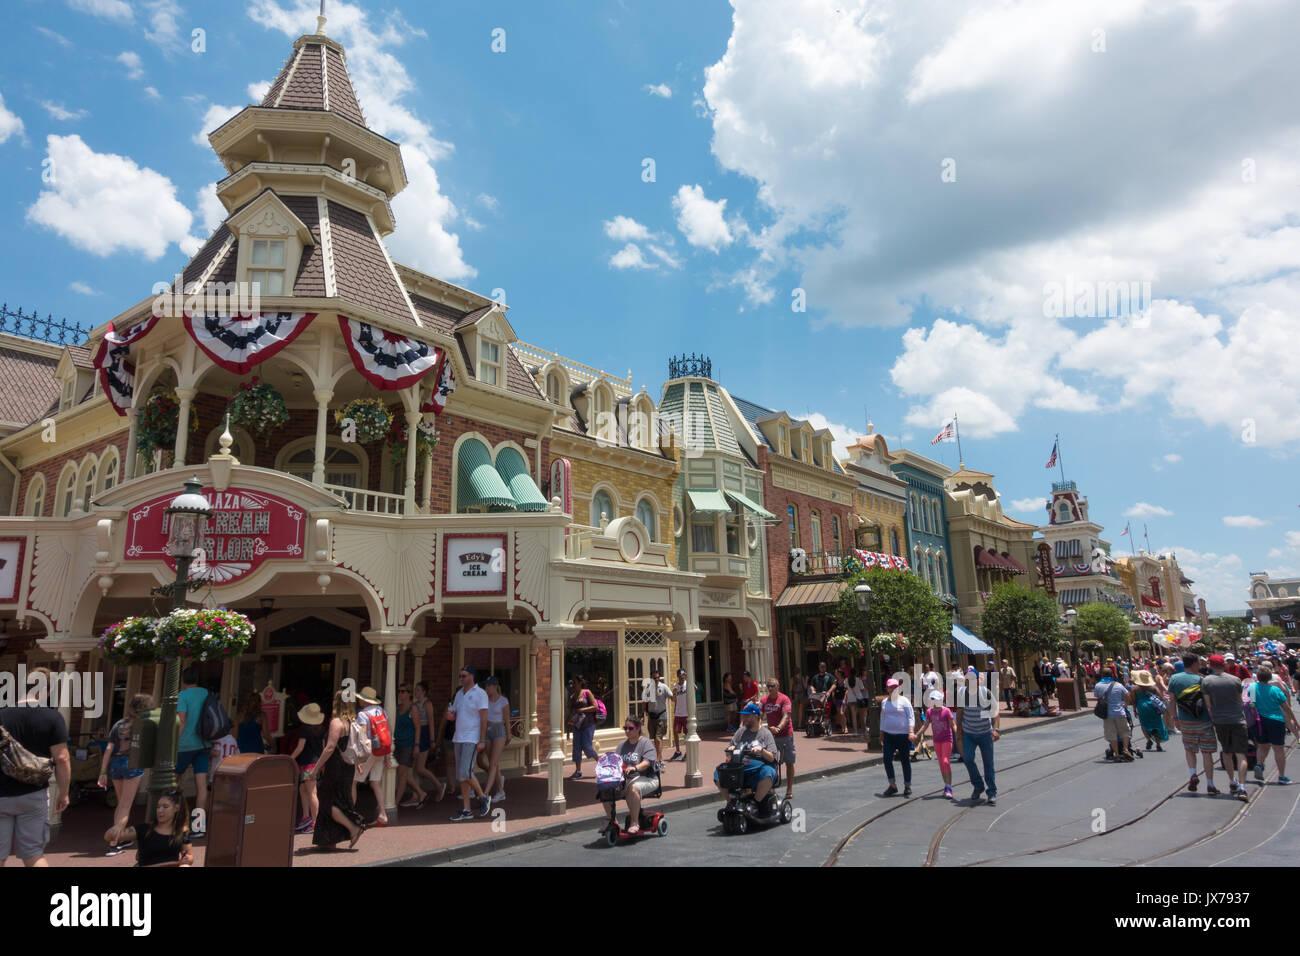 Plaza Ice Cream Parlour on Main Street in Magic Kingdom, Walt Disney World, Orlando, Florida. Stock Photo